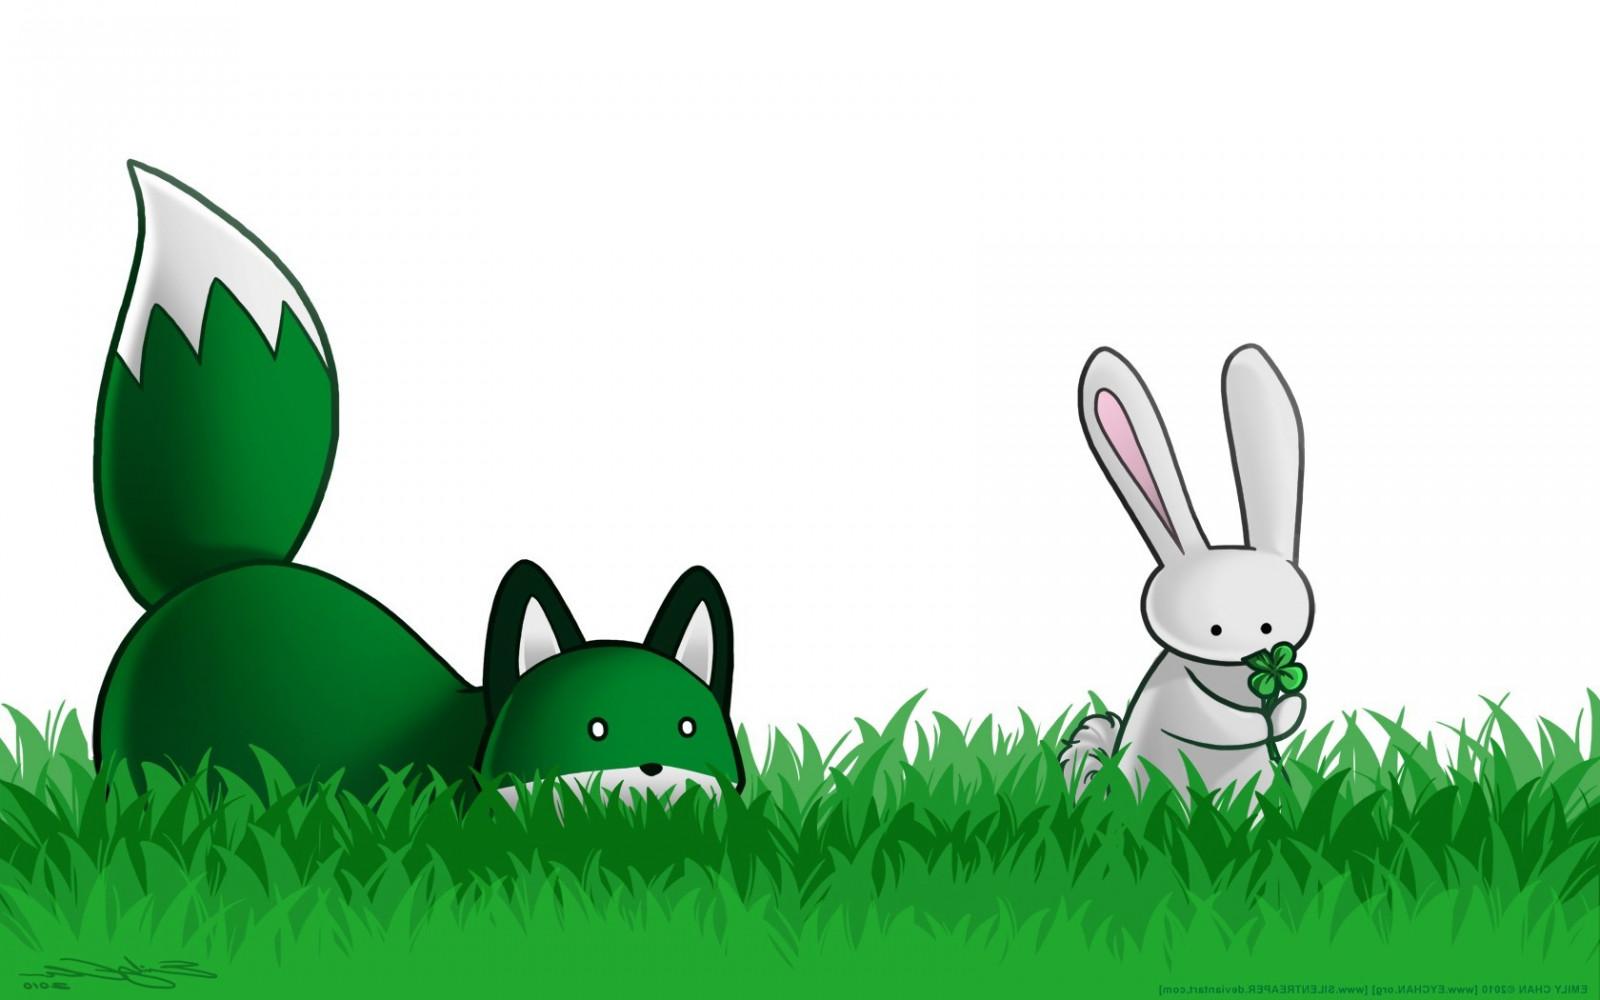 Fond D'écran : Illustration, Animaux, Herbe, Dessin